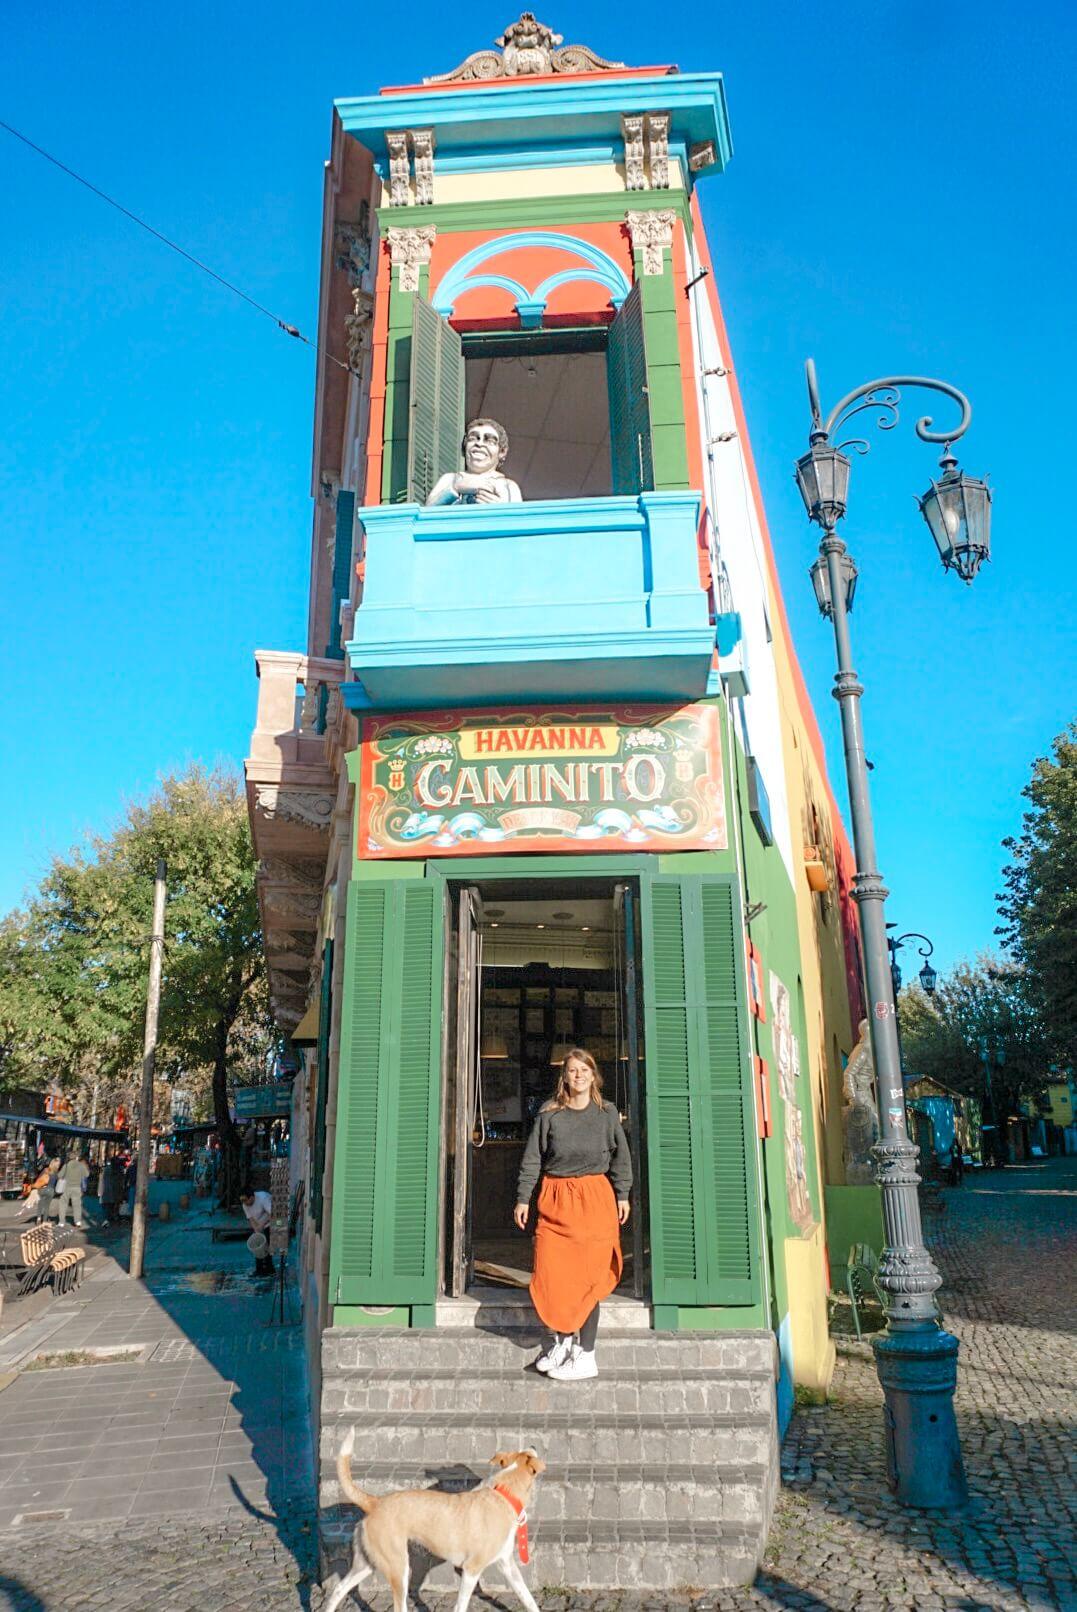 visiter caminito rue colorée buenos aires argentine blog